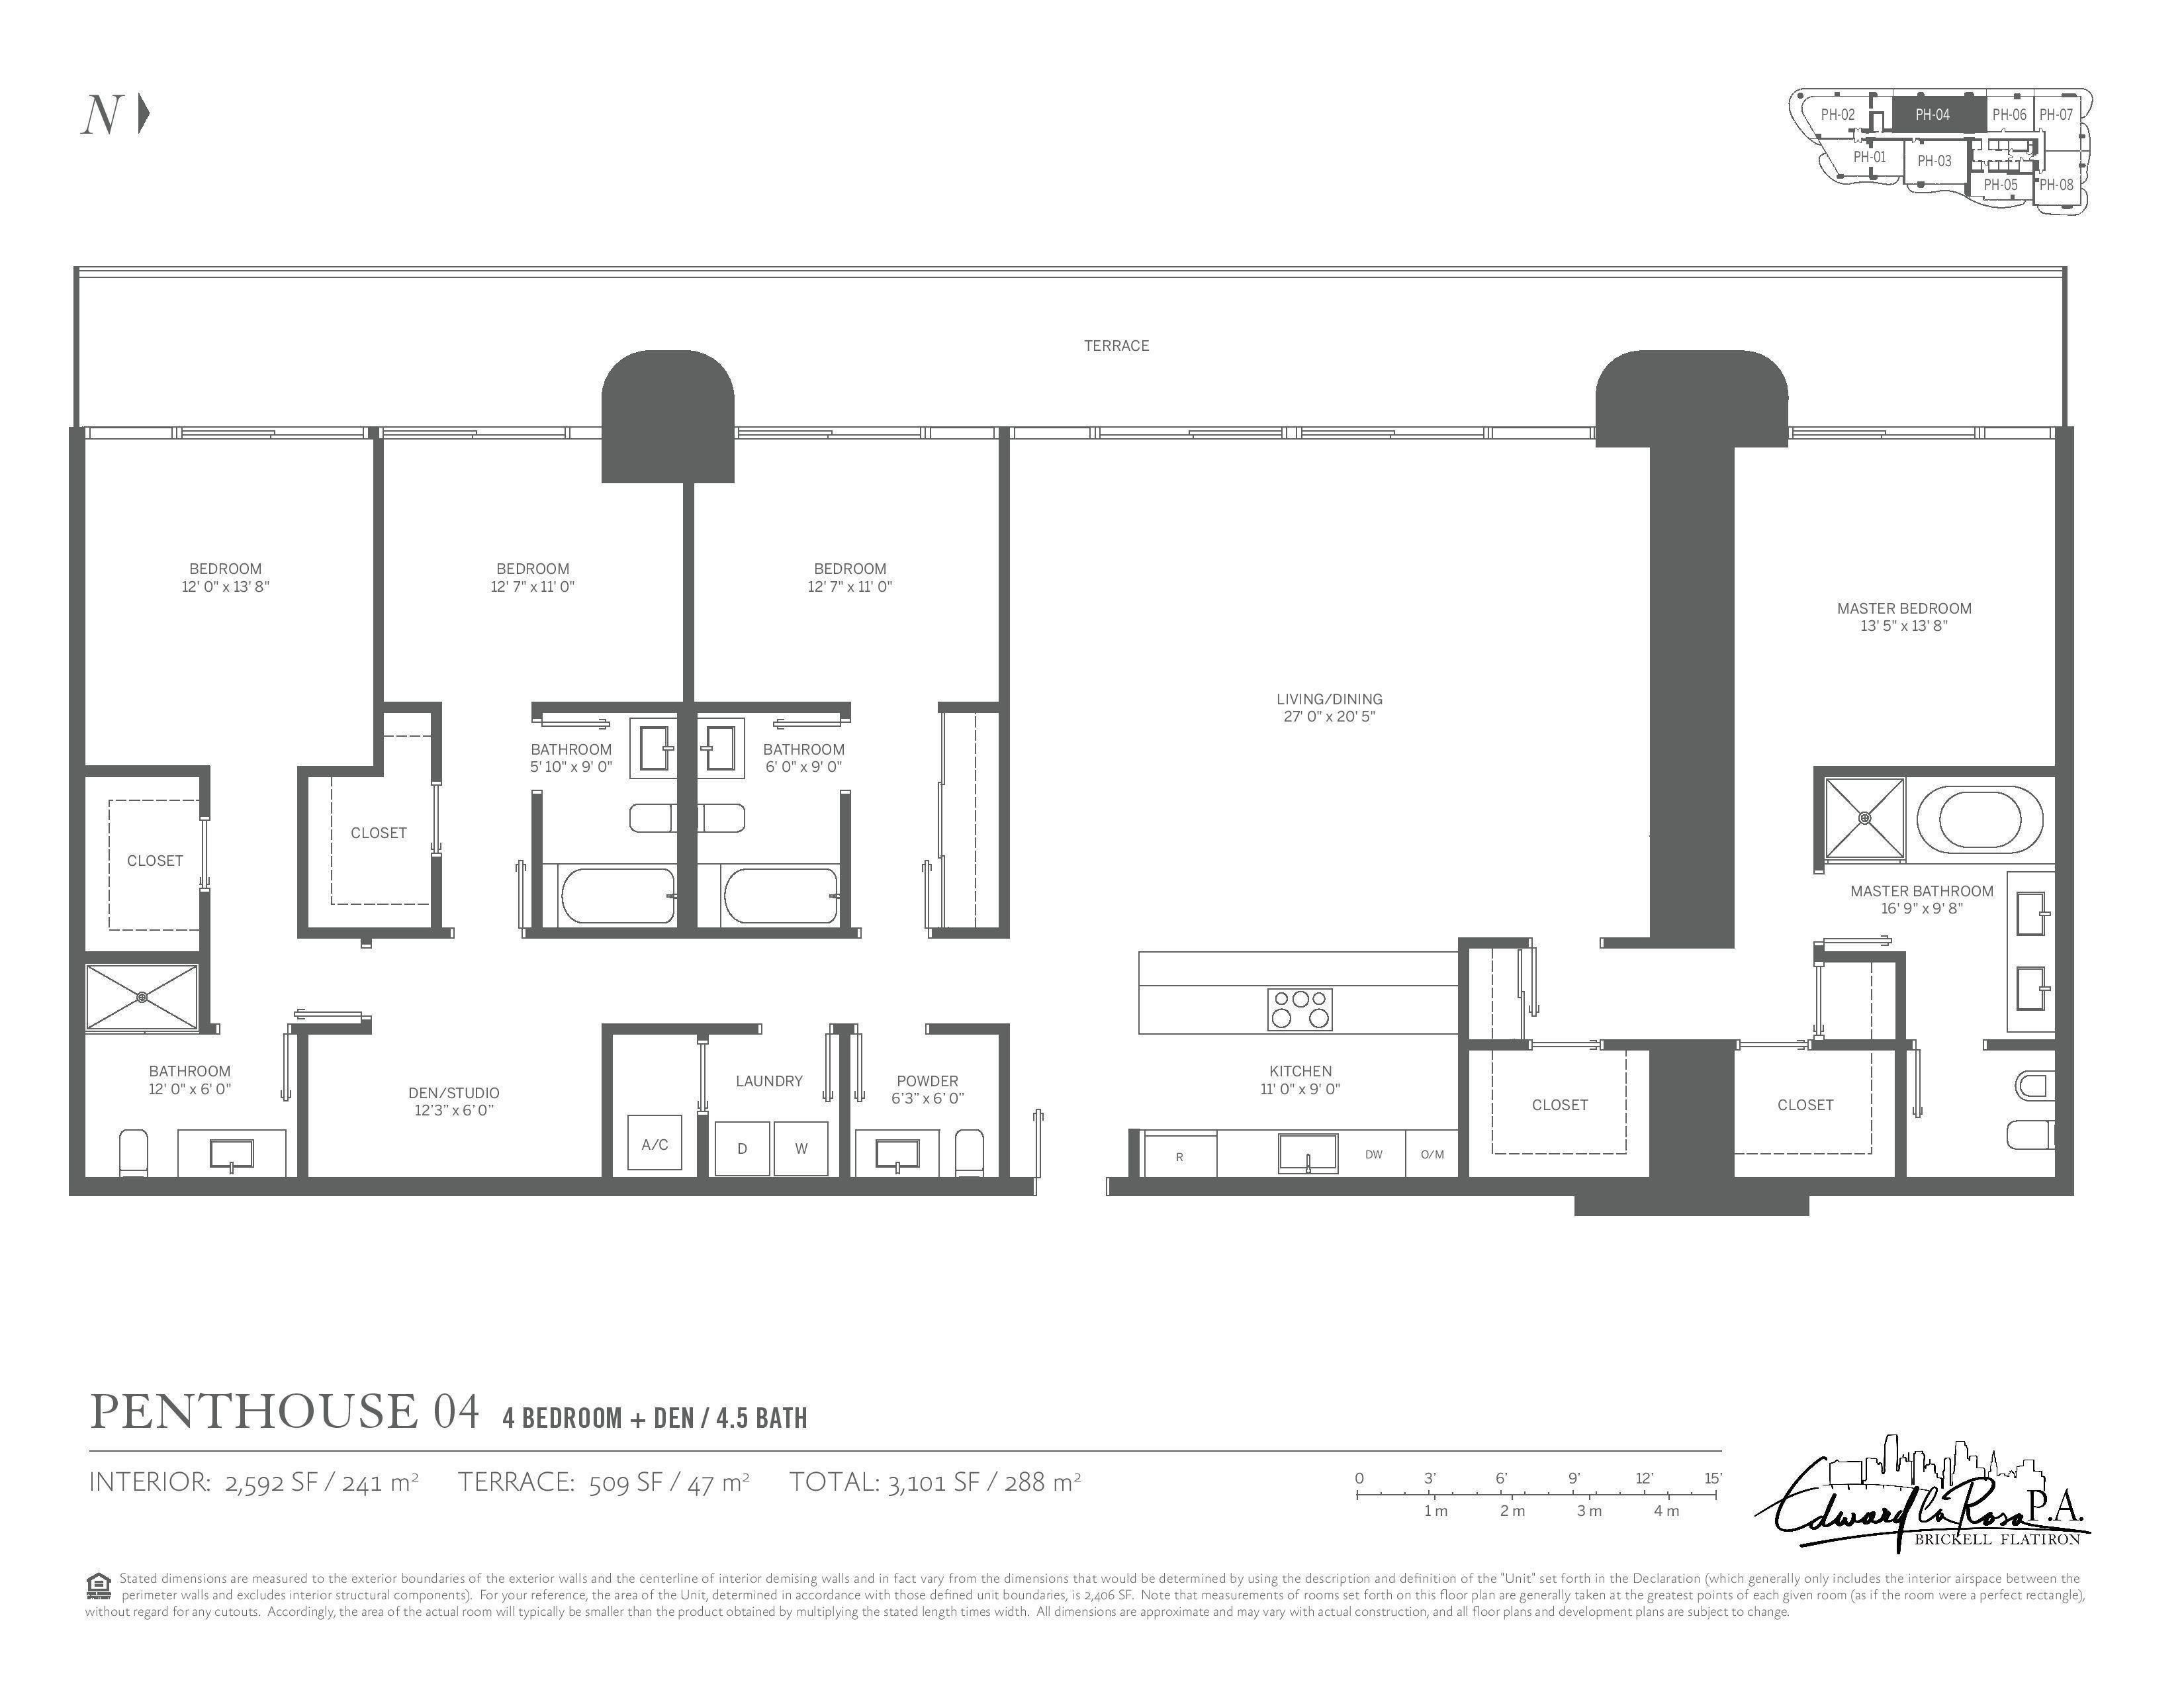 Floor Plans Brickell Flatiron Miami Florida Floor Plans Brickell Flatiron How To Plan